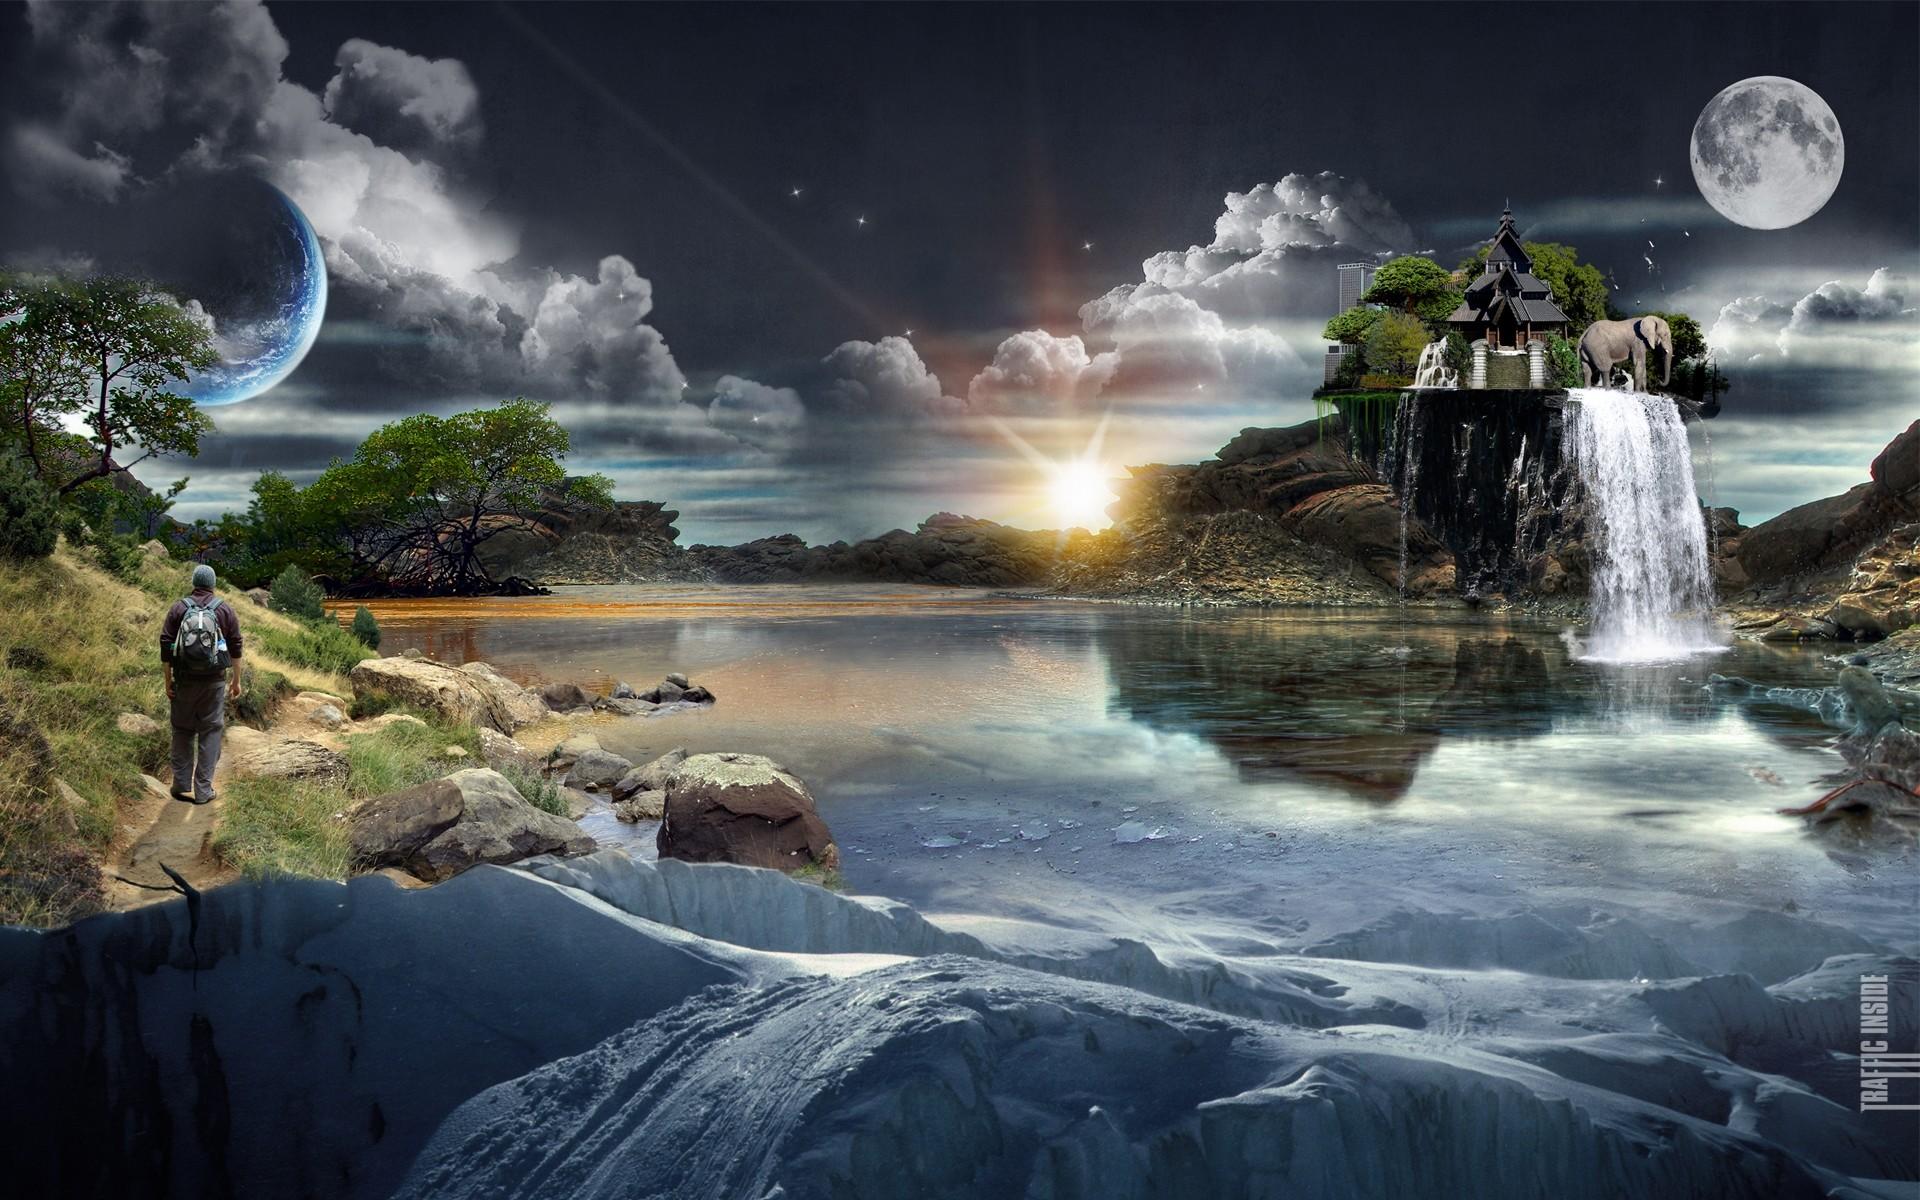 Amazing Scenery HD Wallpaper. 3D Wallpapers